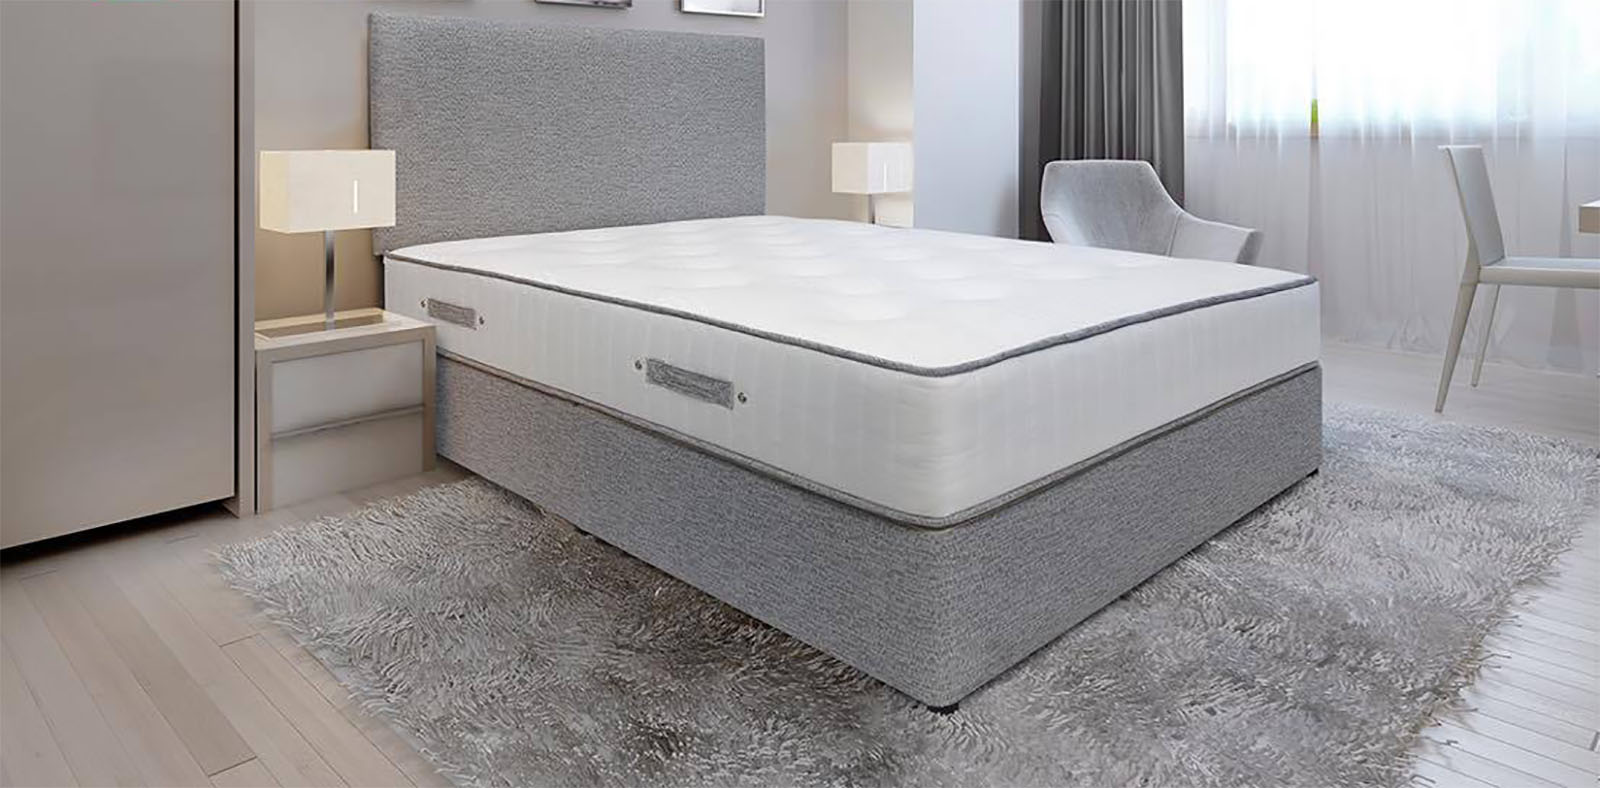 Evo divan set base matress headboard